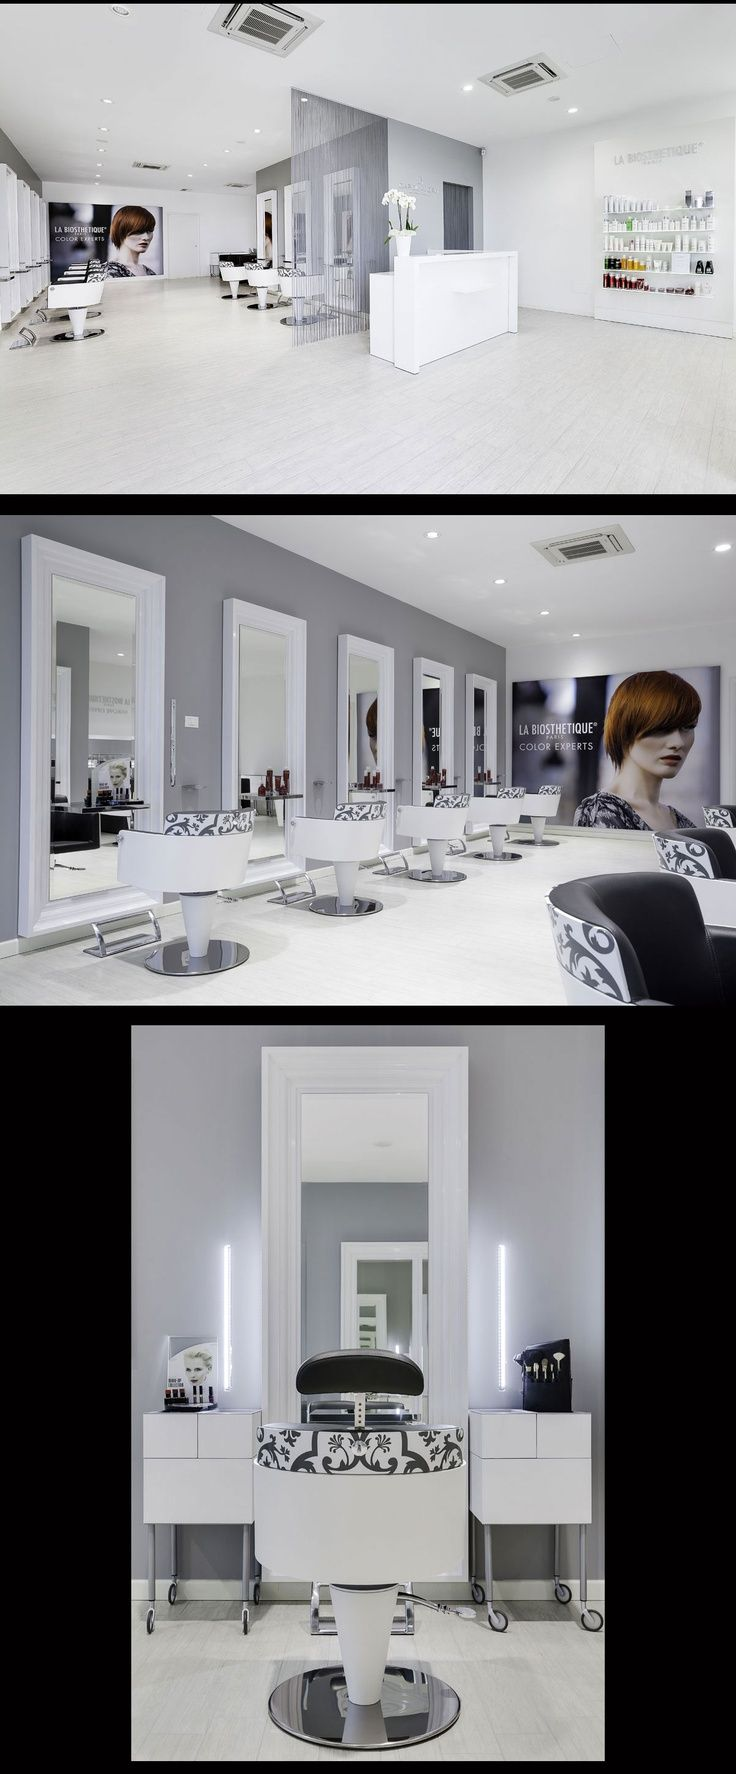 Hair Salon Capolavoro - Mantova (Italy) - Salon Design by Mauro ...